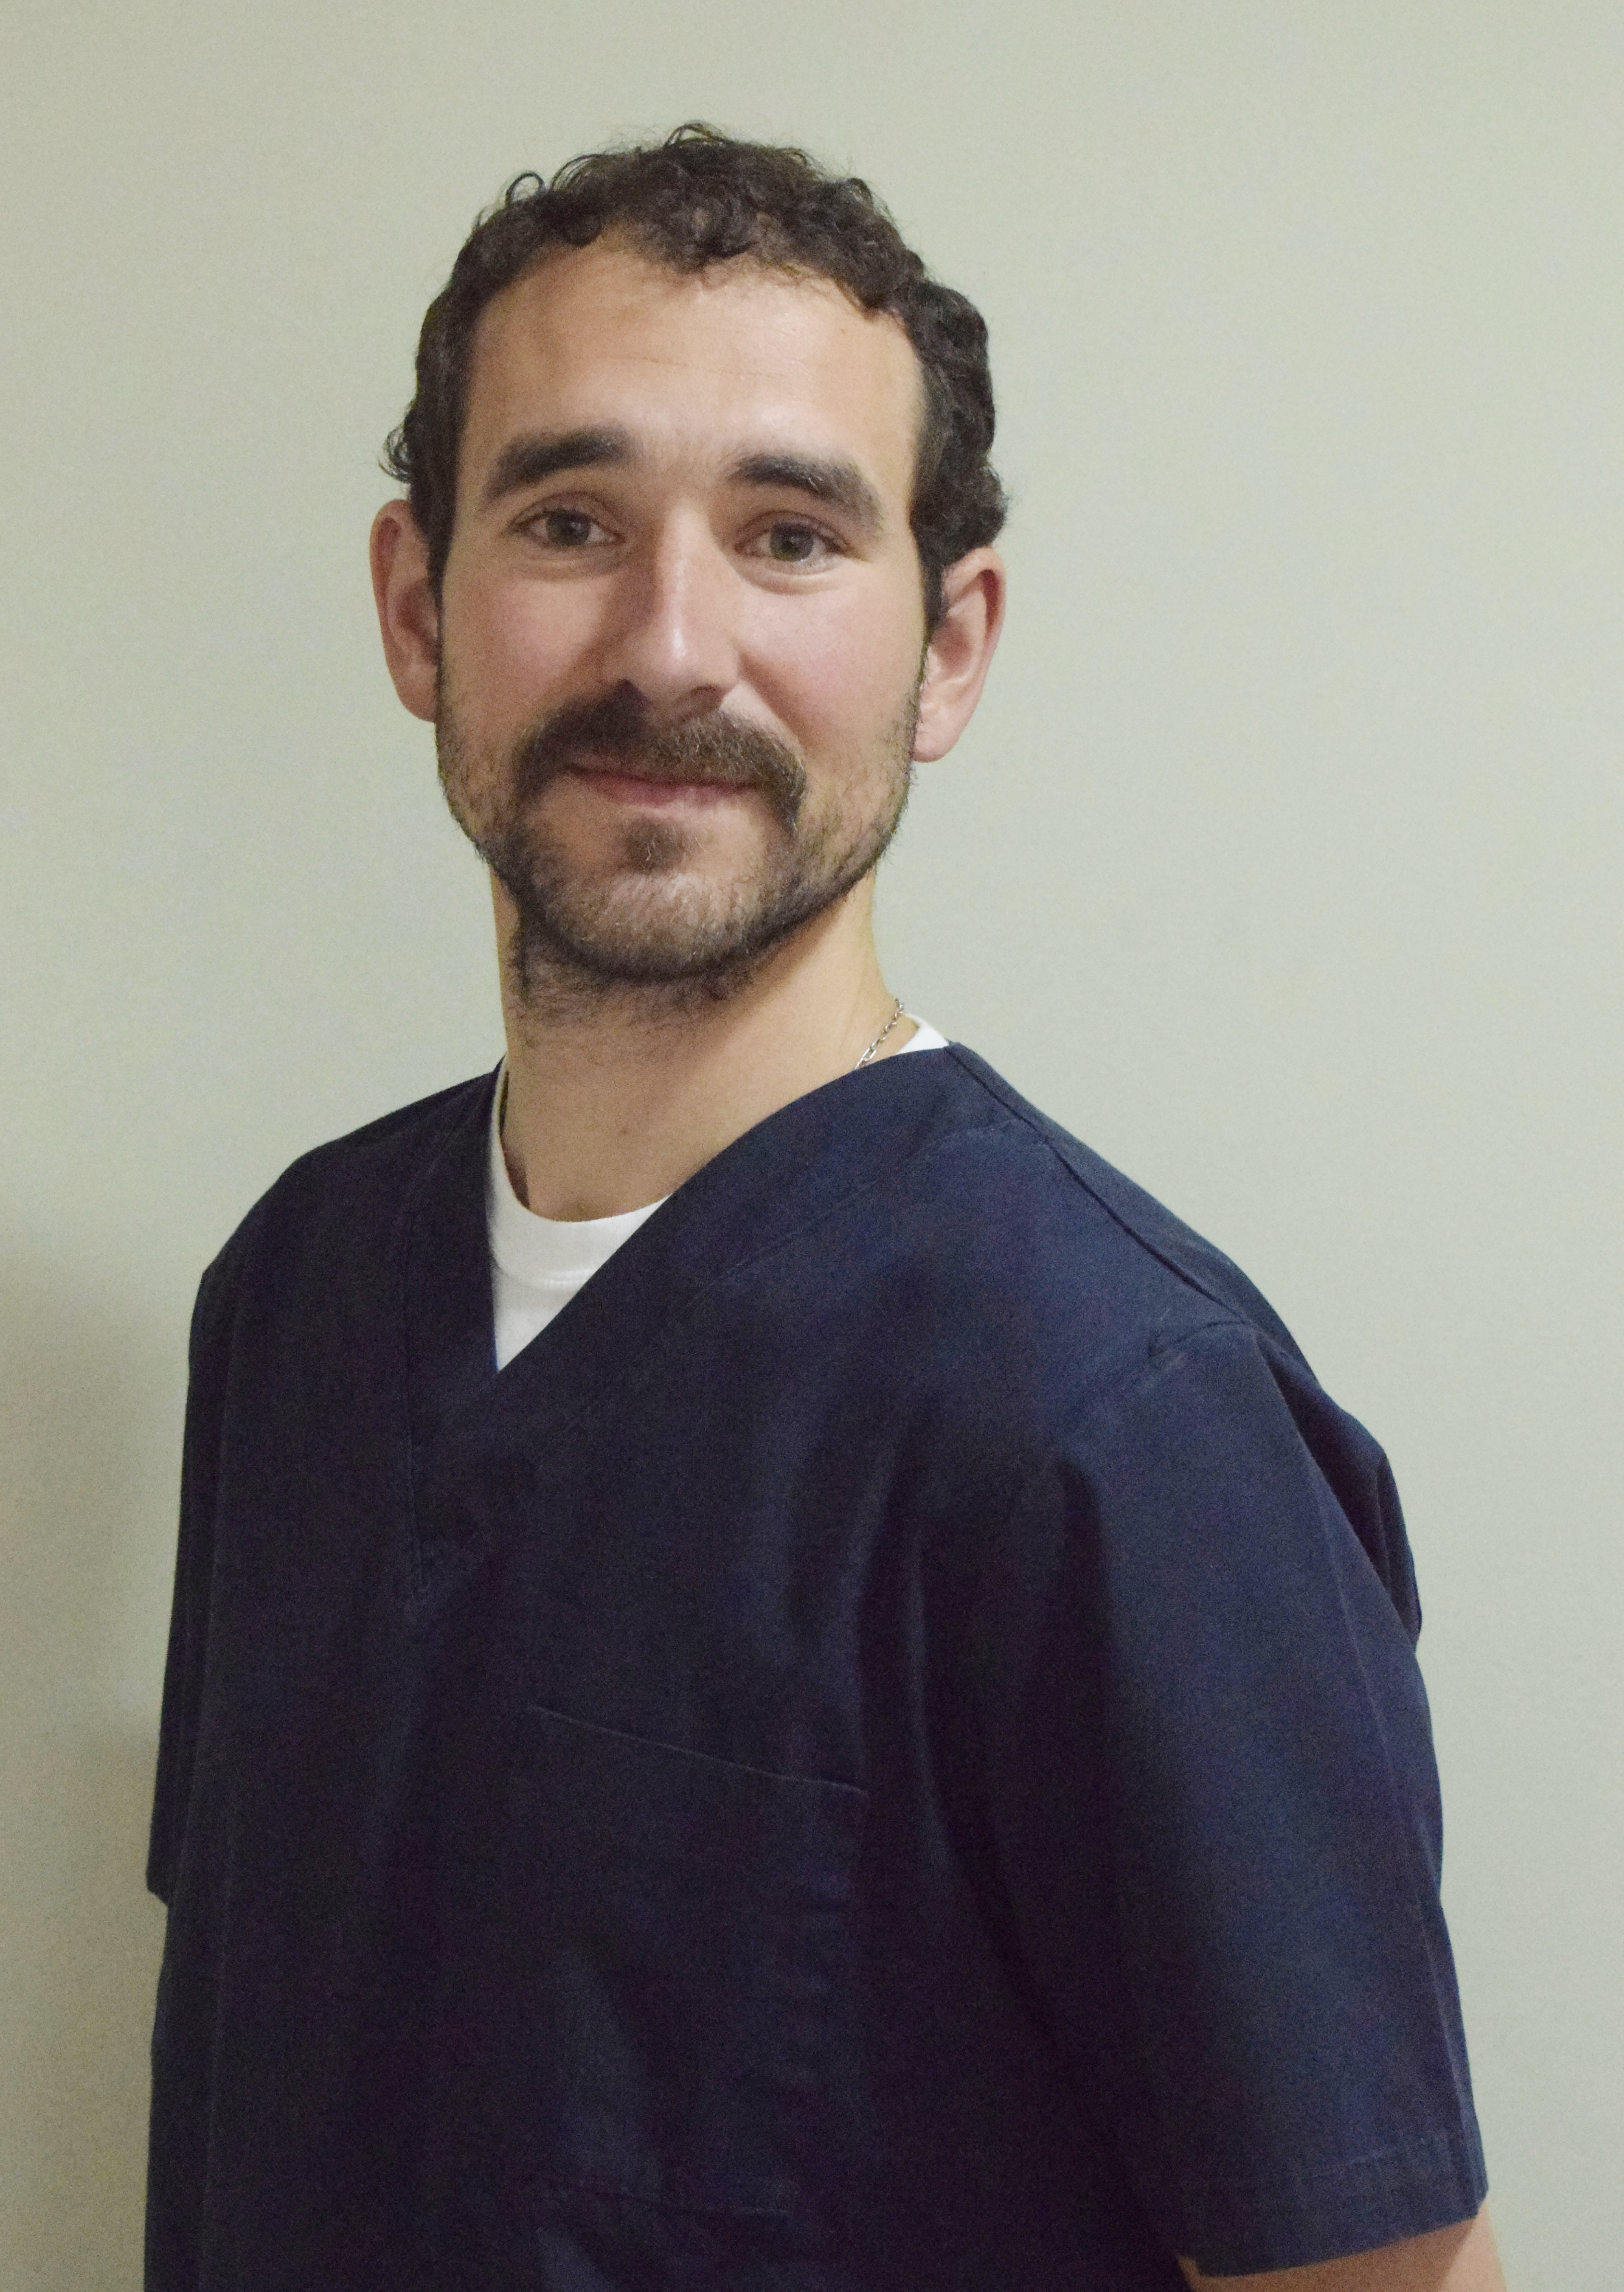 DR MAXIMILIANO OLGUIN